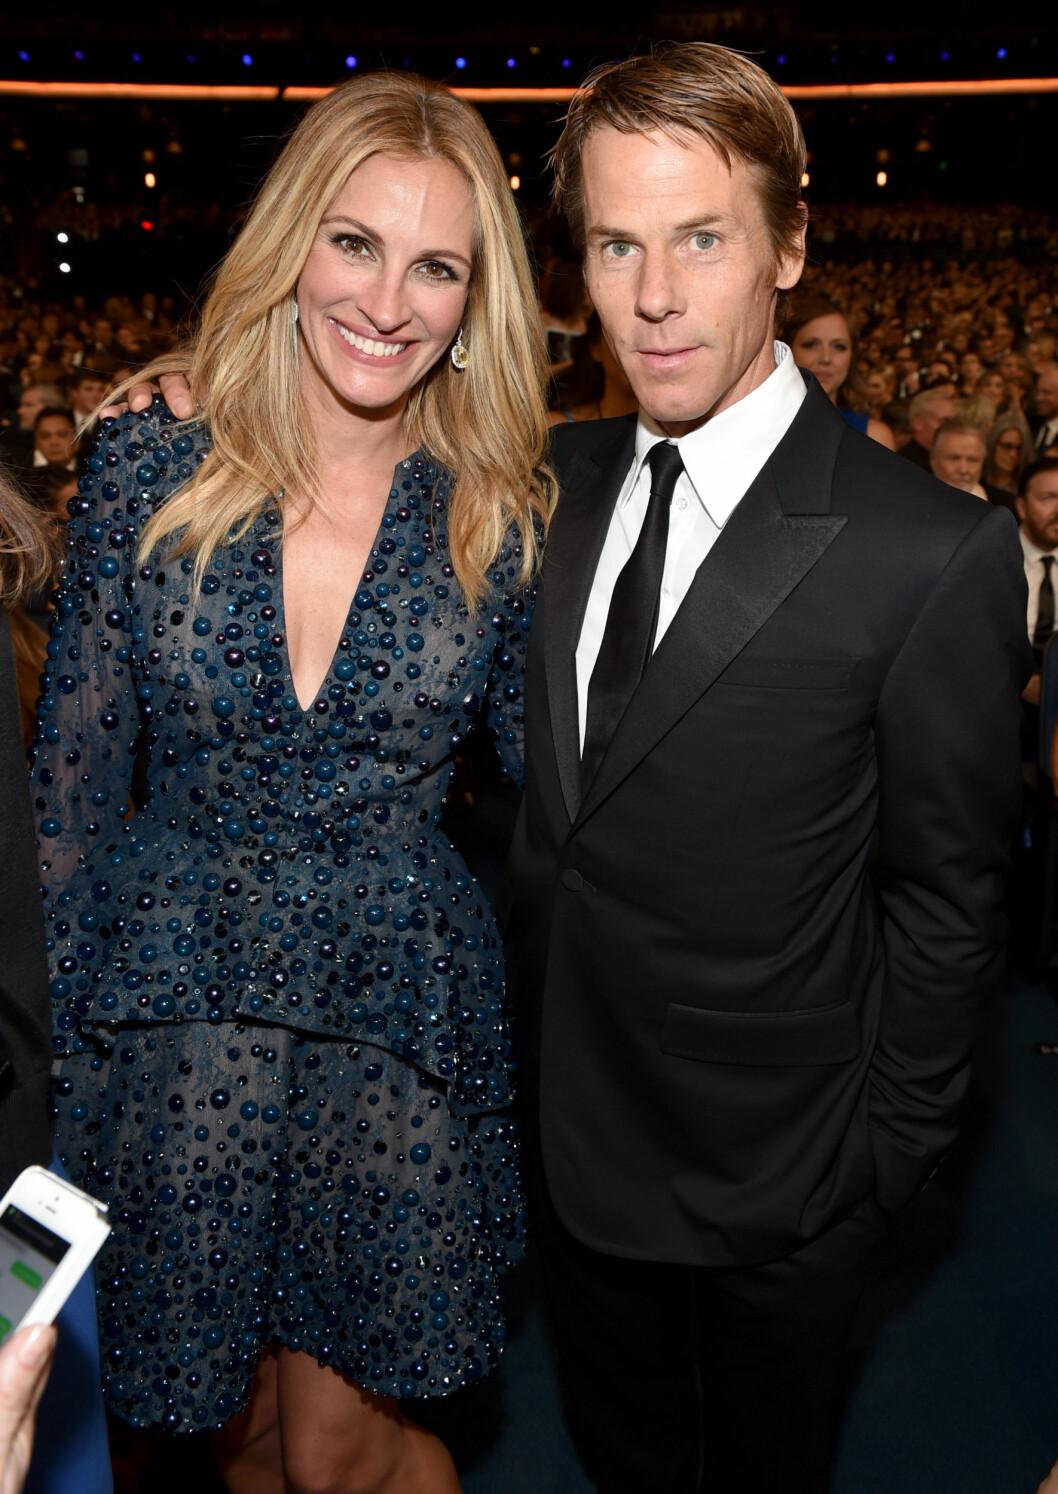 Her er ekteparet sammen under Emmy Awards 2014.